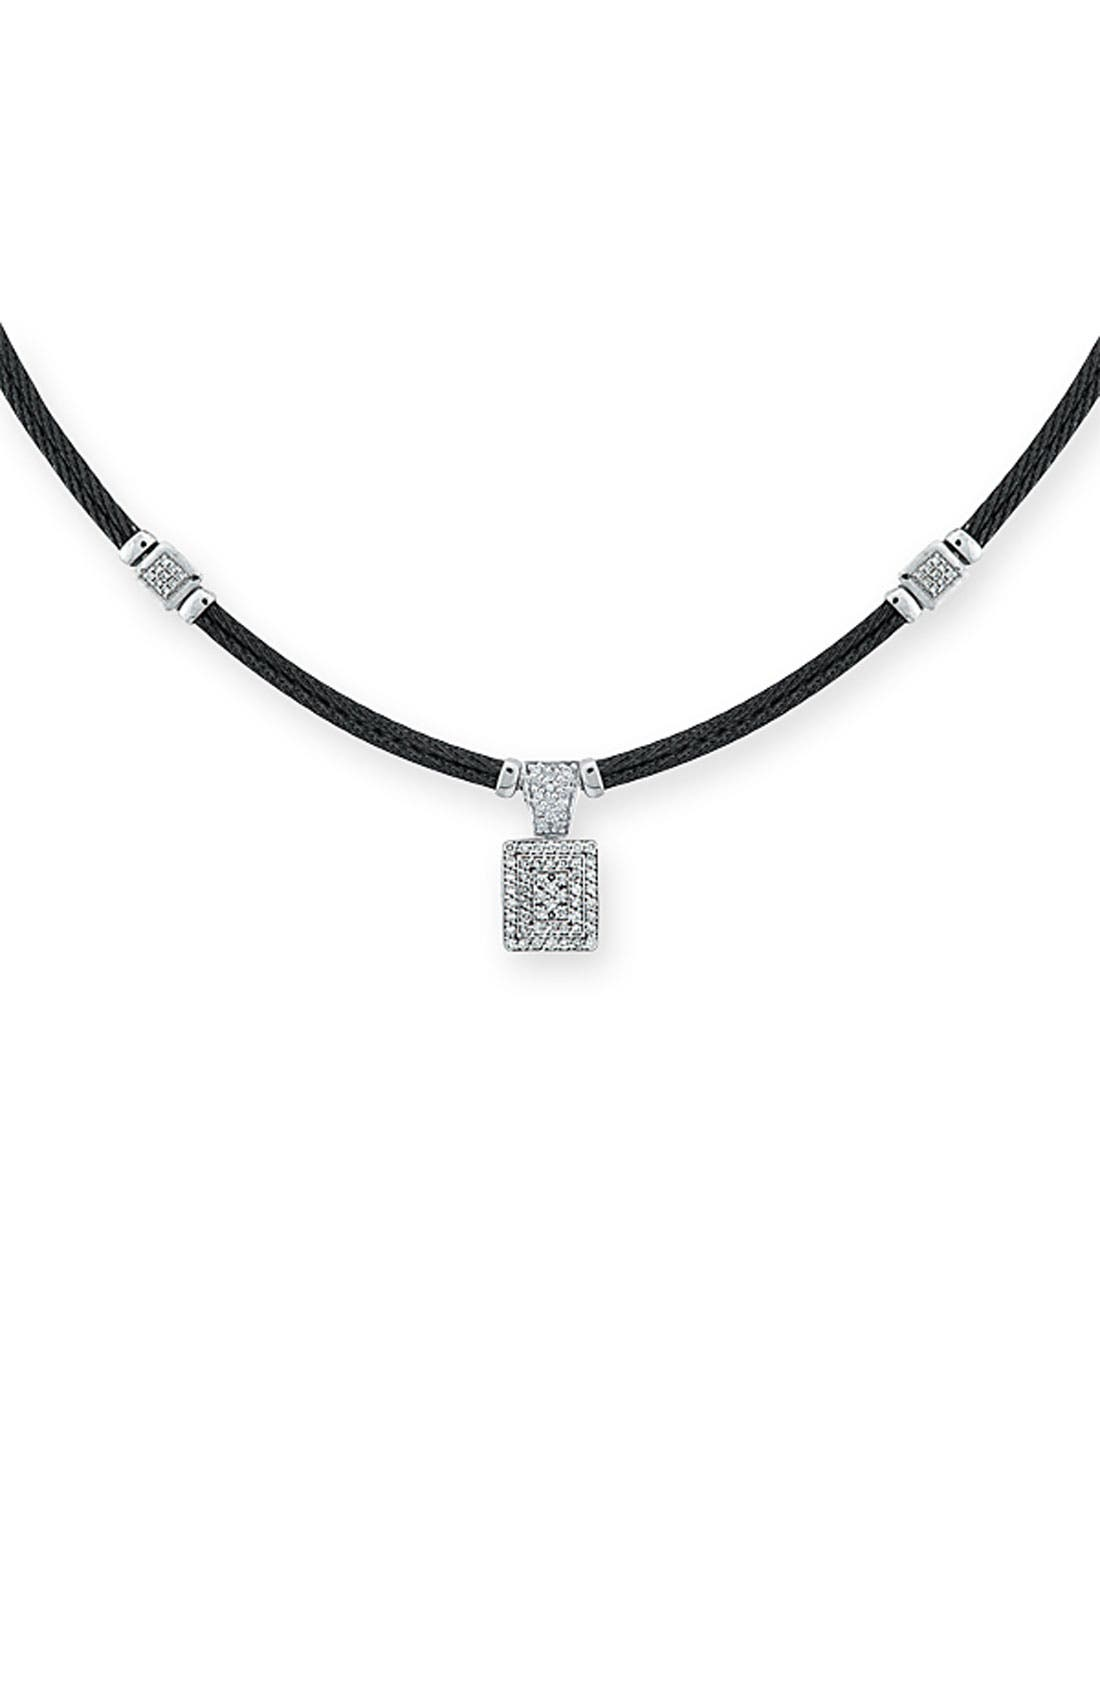 Main Image - ALOR® Two Row Diamond Necklace